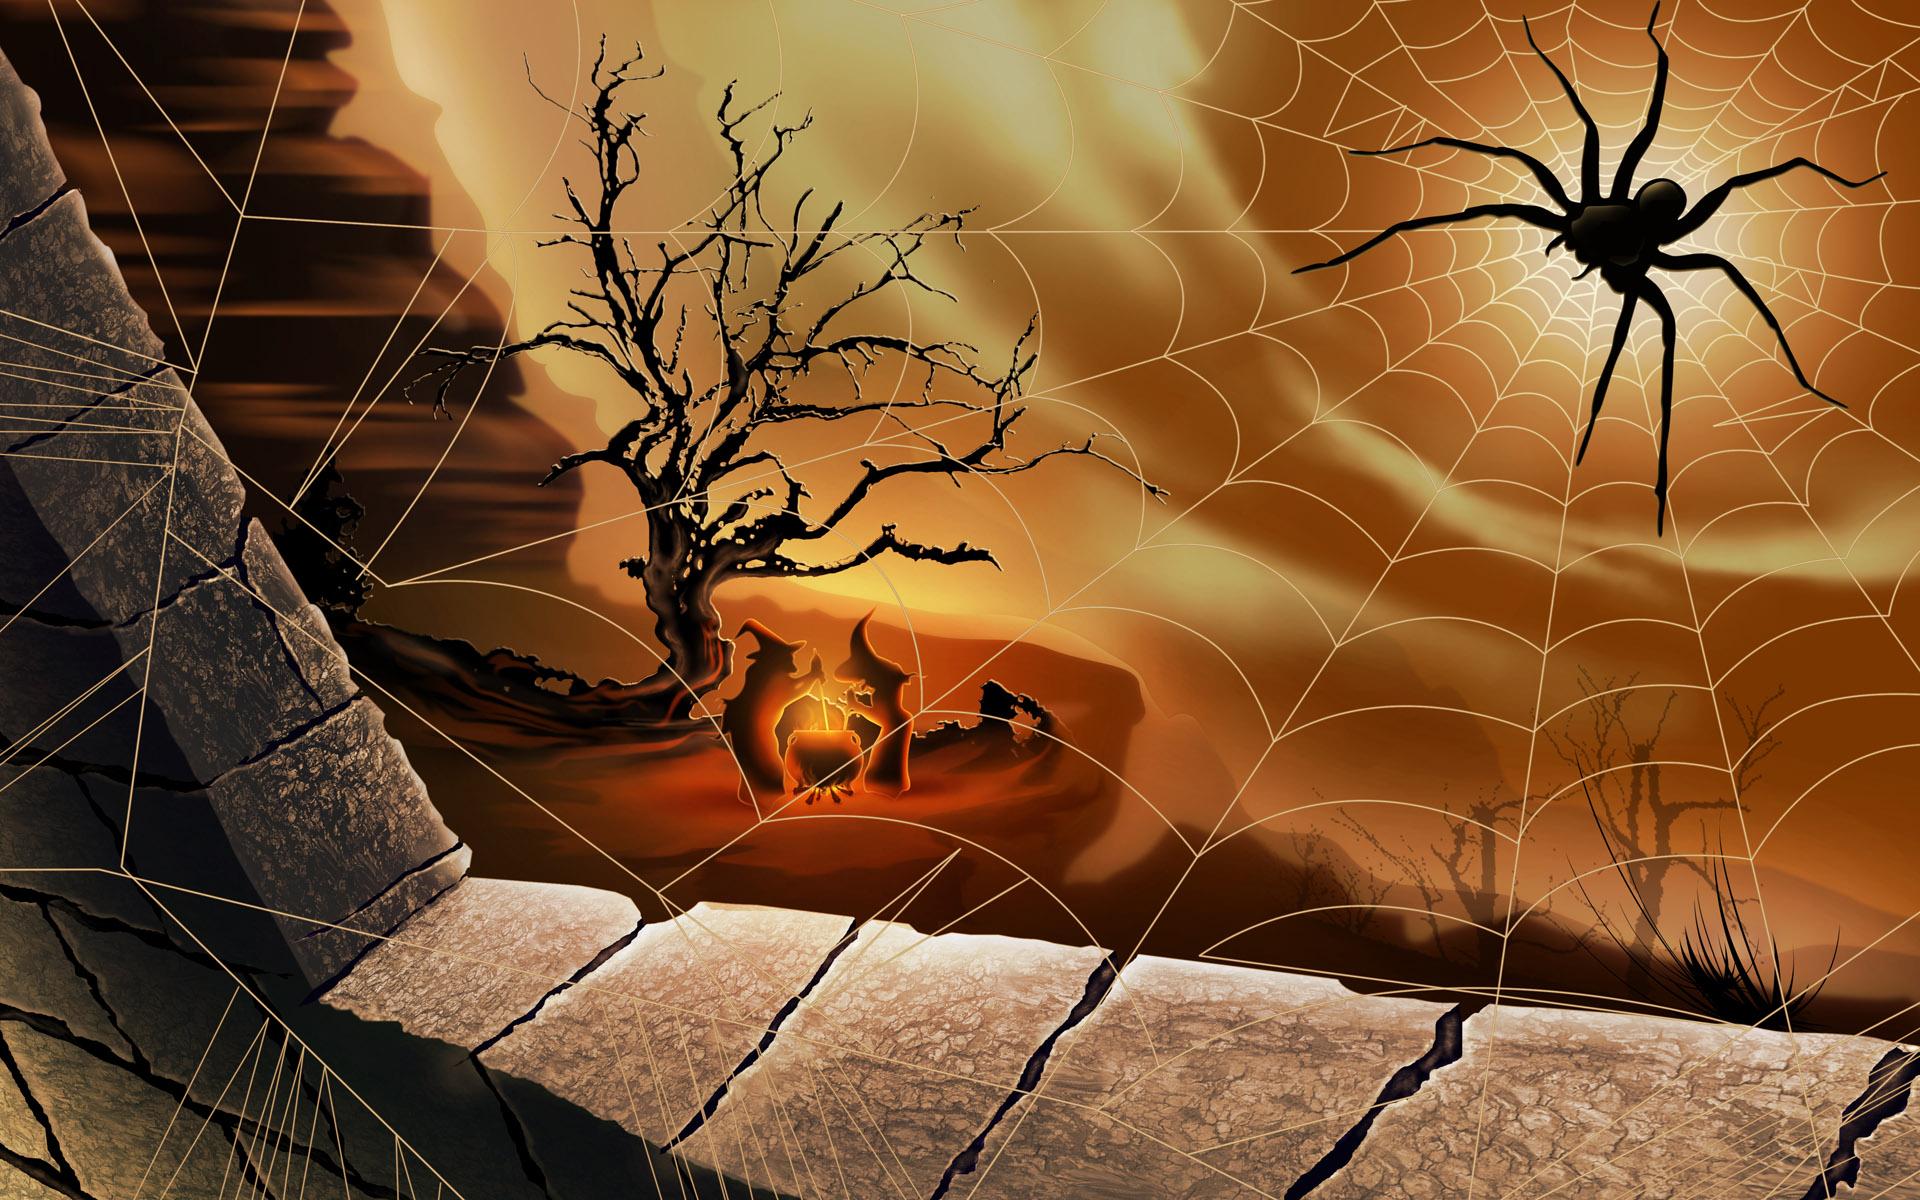 Spiders, Webs & Witchcraft — Desirée M  Mondesir